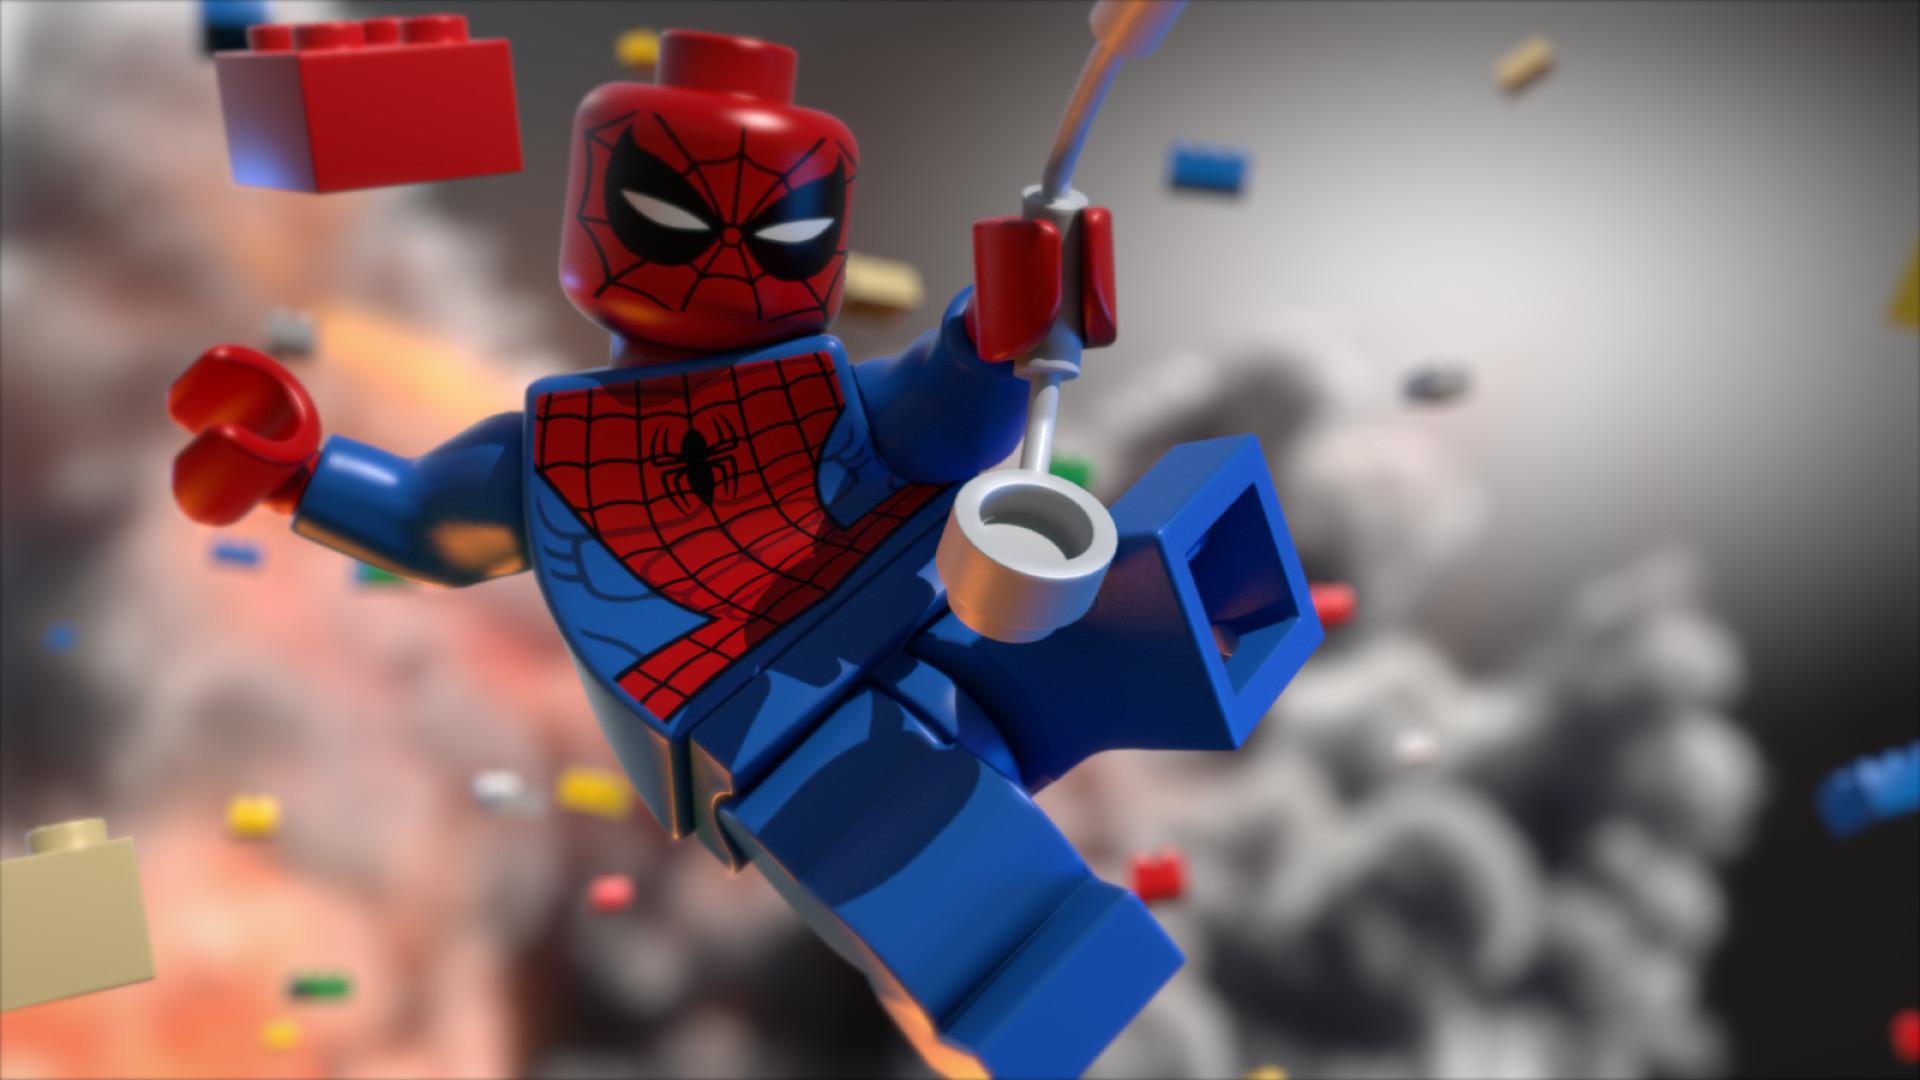 Lego Avengers Wallpaper Hd 74 Images